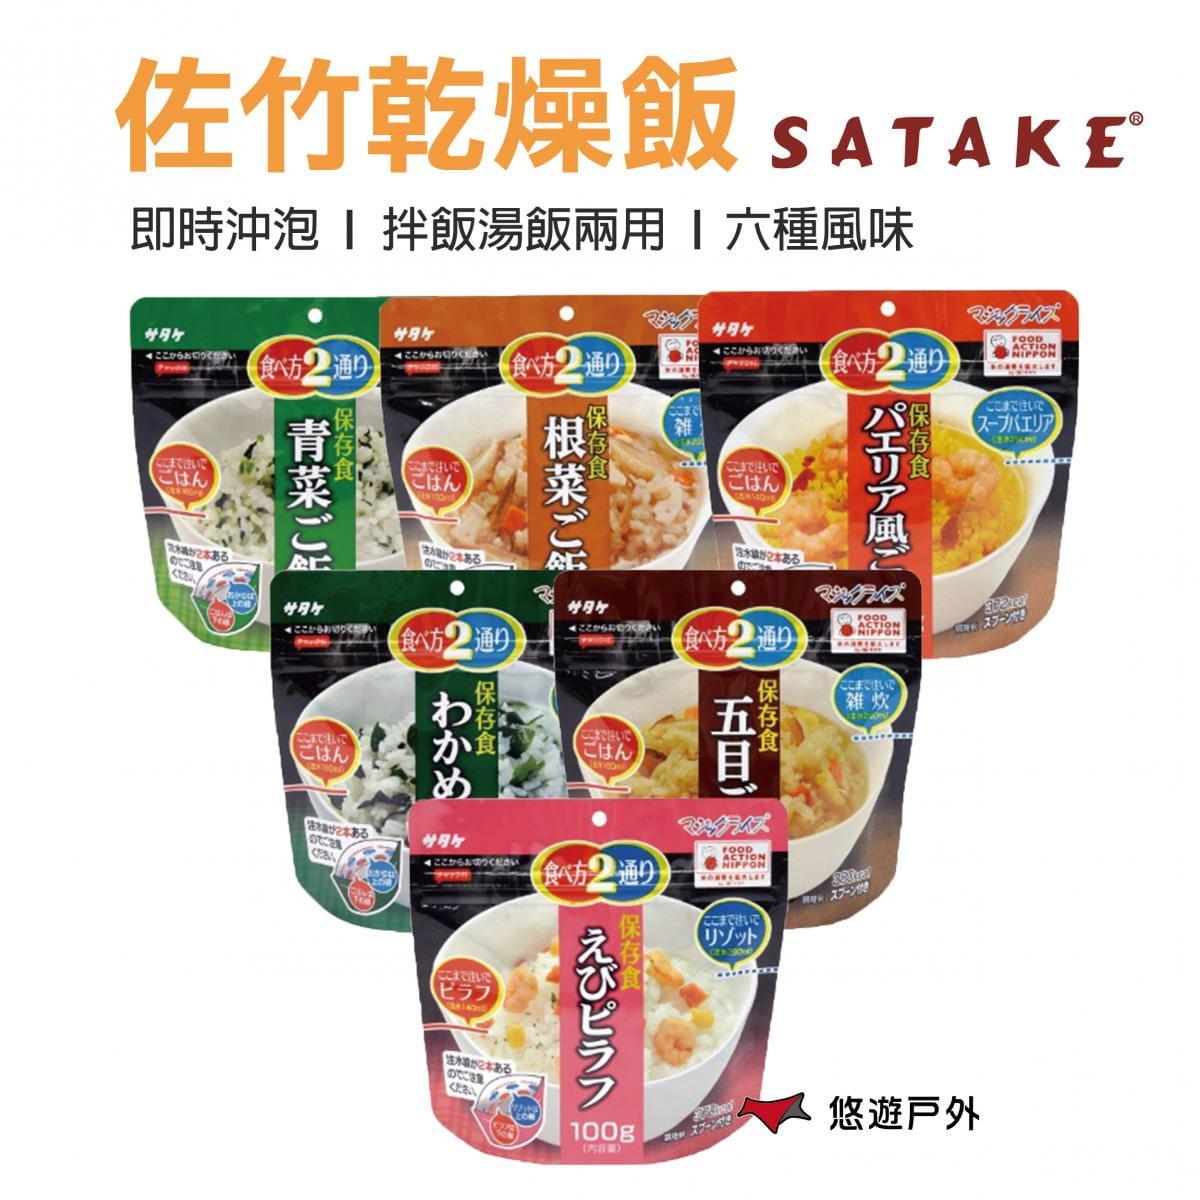 SATAKE 日本佐竹乾燥飯 (葷食區)